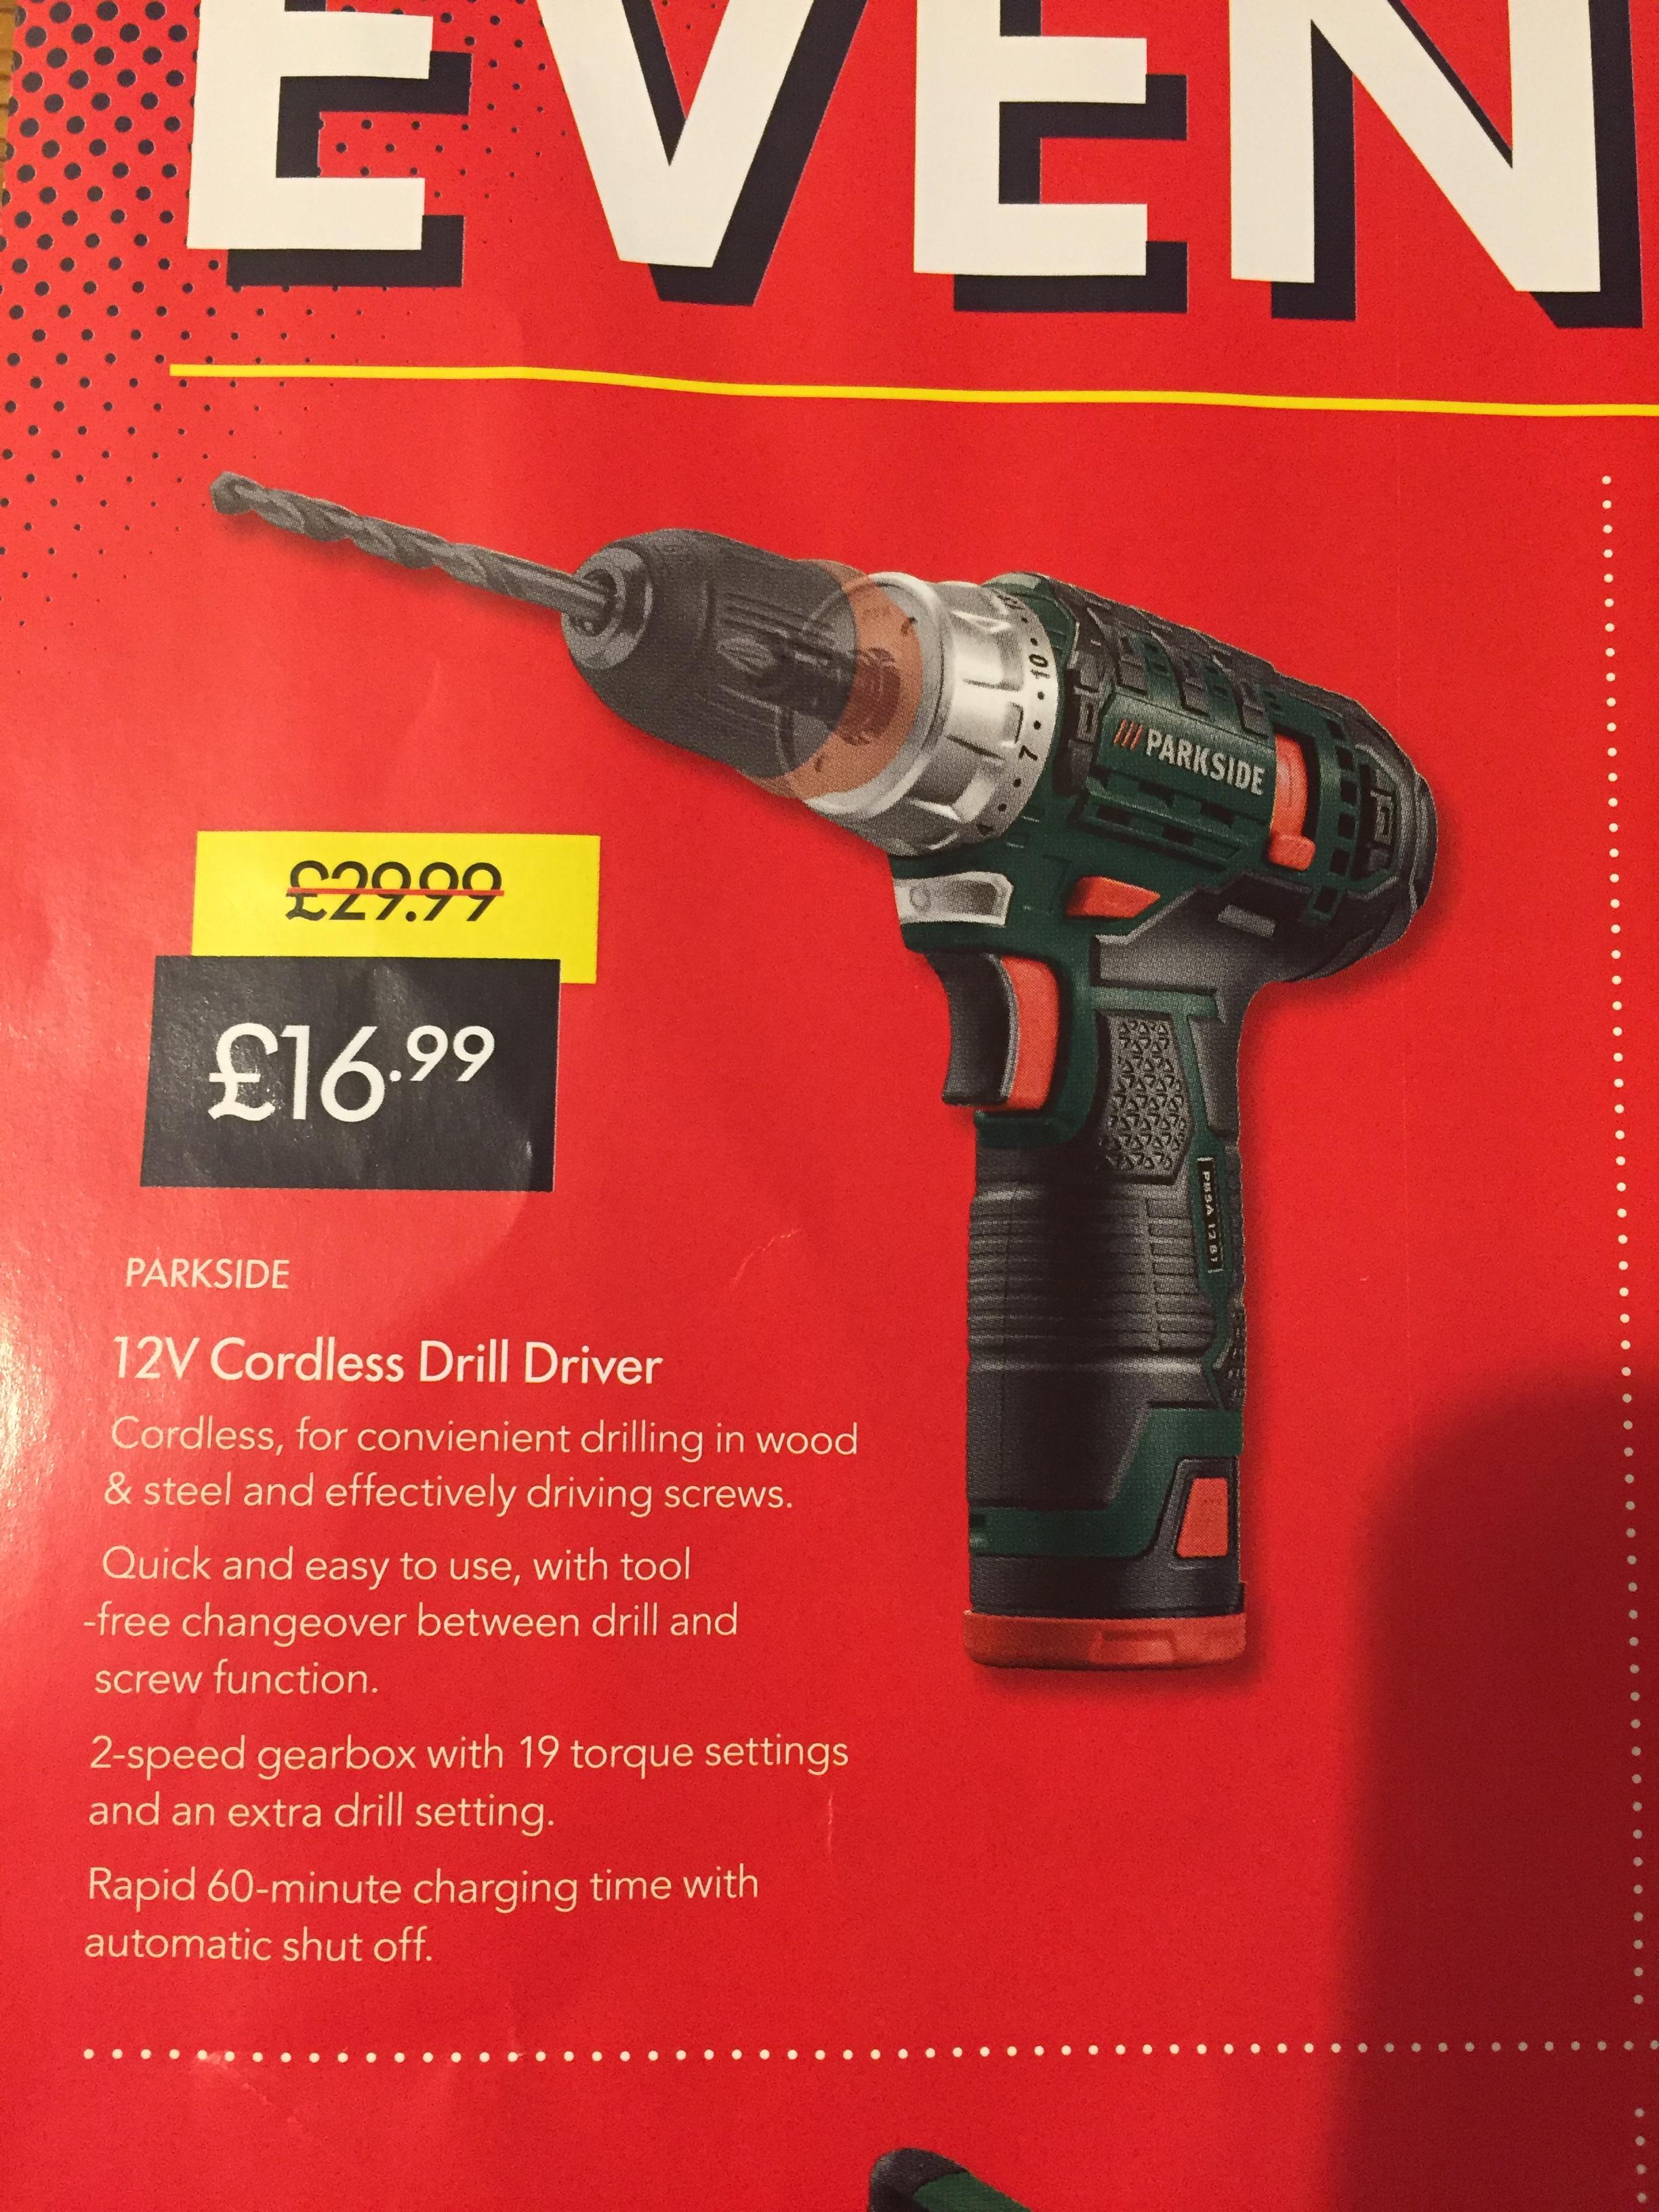 Parkside 12V Cordless Drill At Lidl £16.99